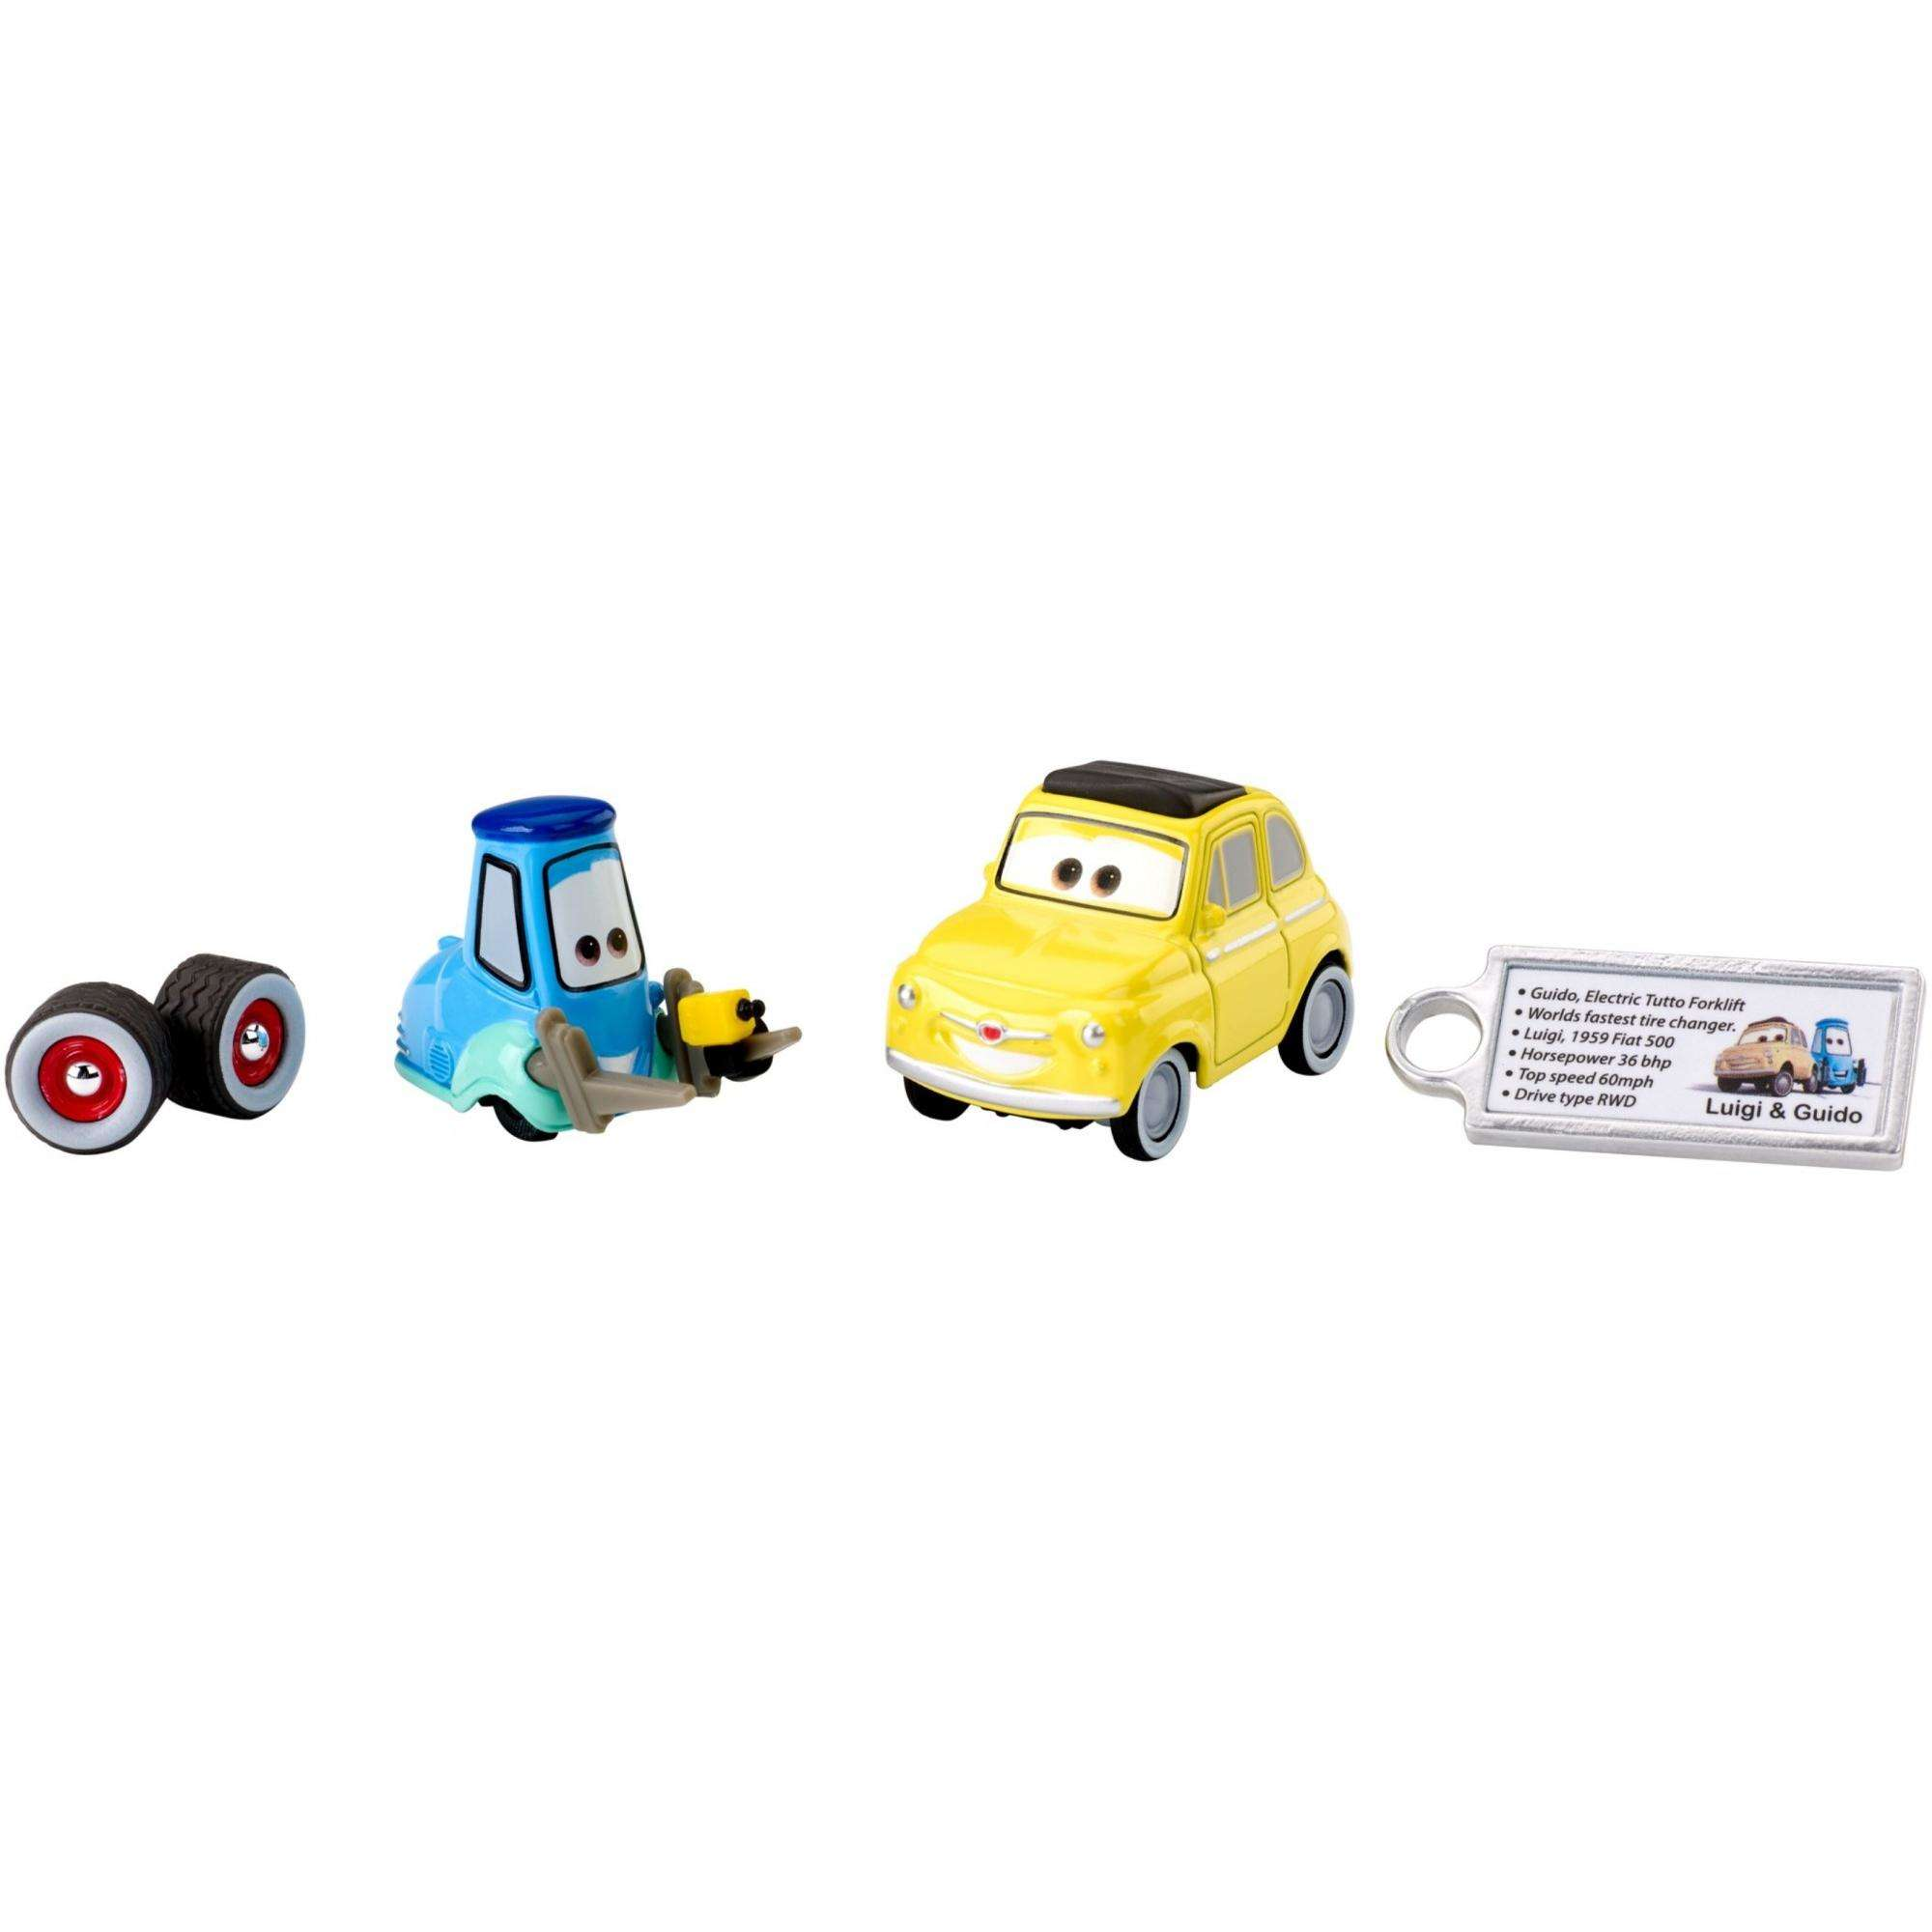 Disney Pixar Cars Precision Series Guido Luigi Die Cast Vehicles